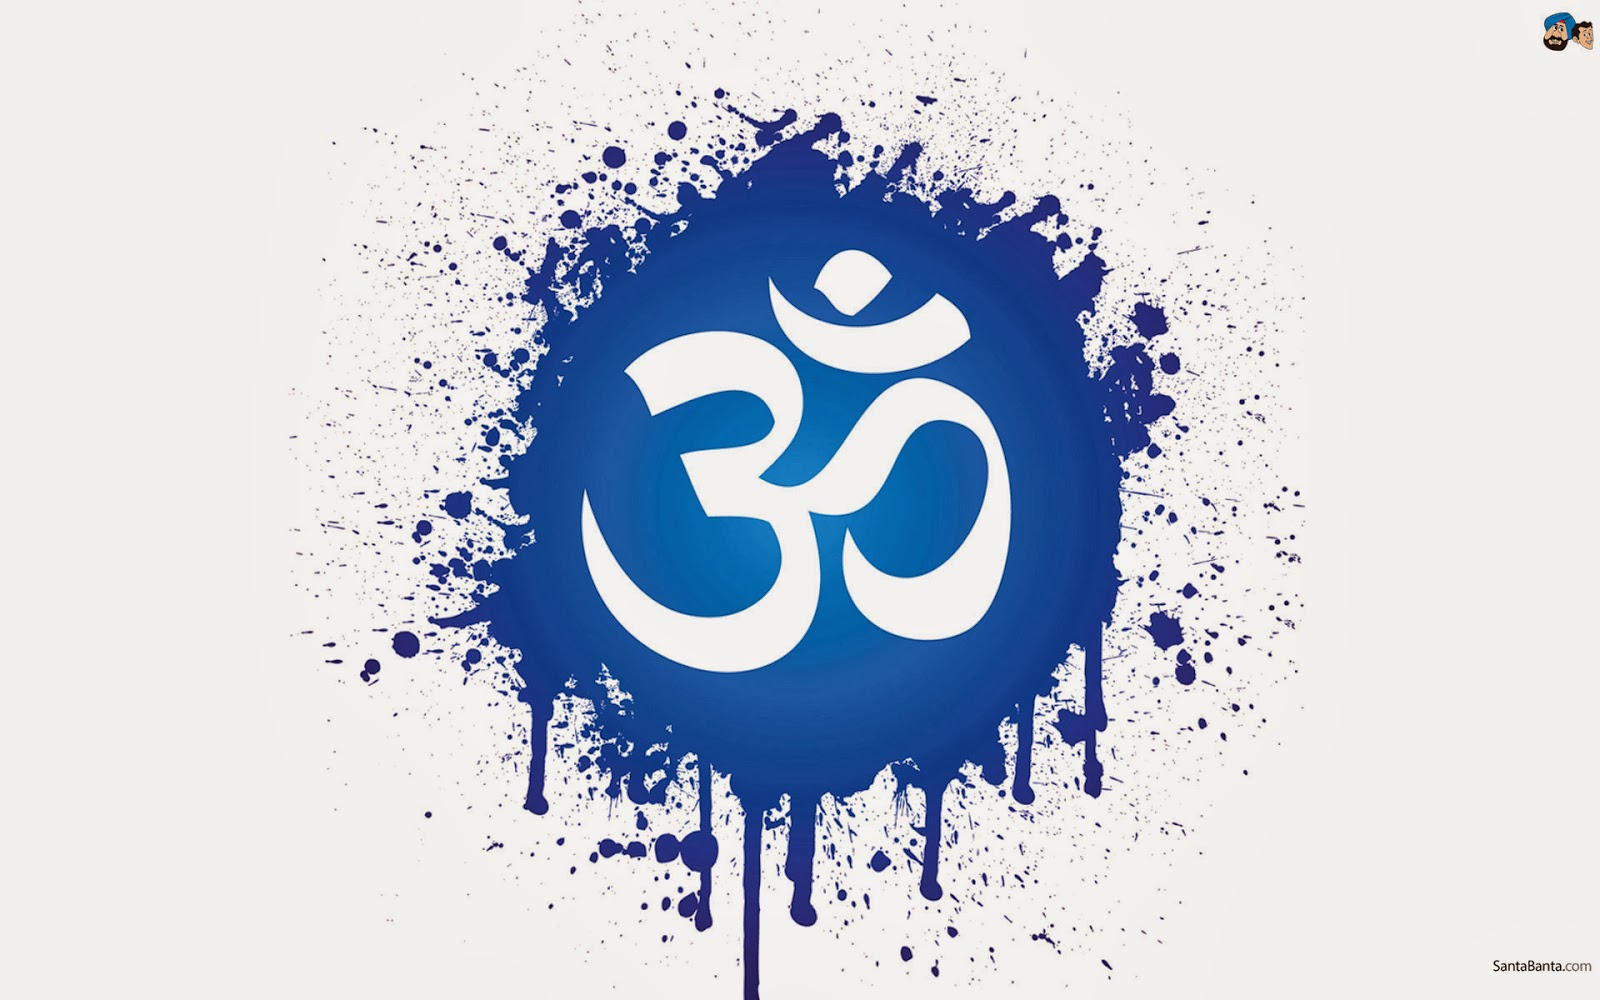 Krishna 3d Wallpaper For Mobile Bhagwan Ji Help Me Download Om Hq Desktop Wallpapers Om